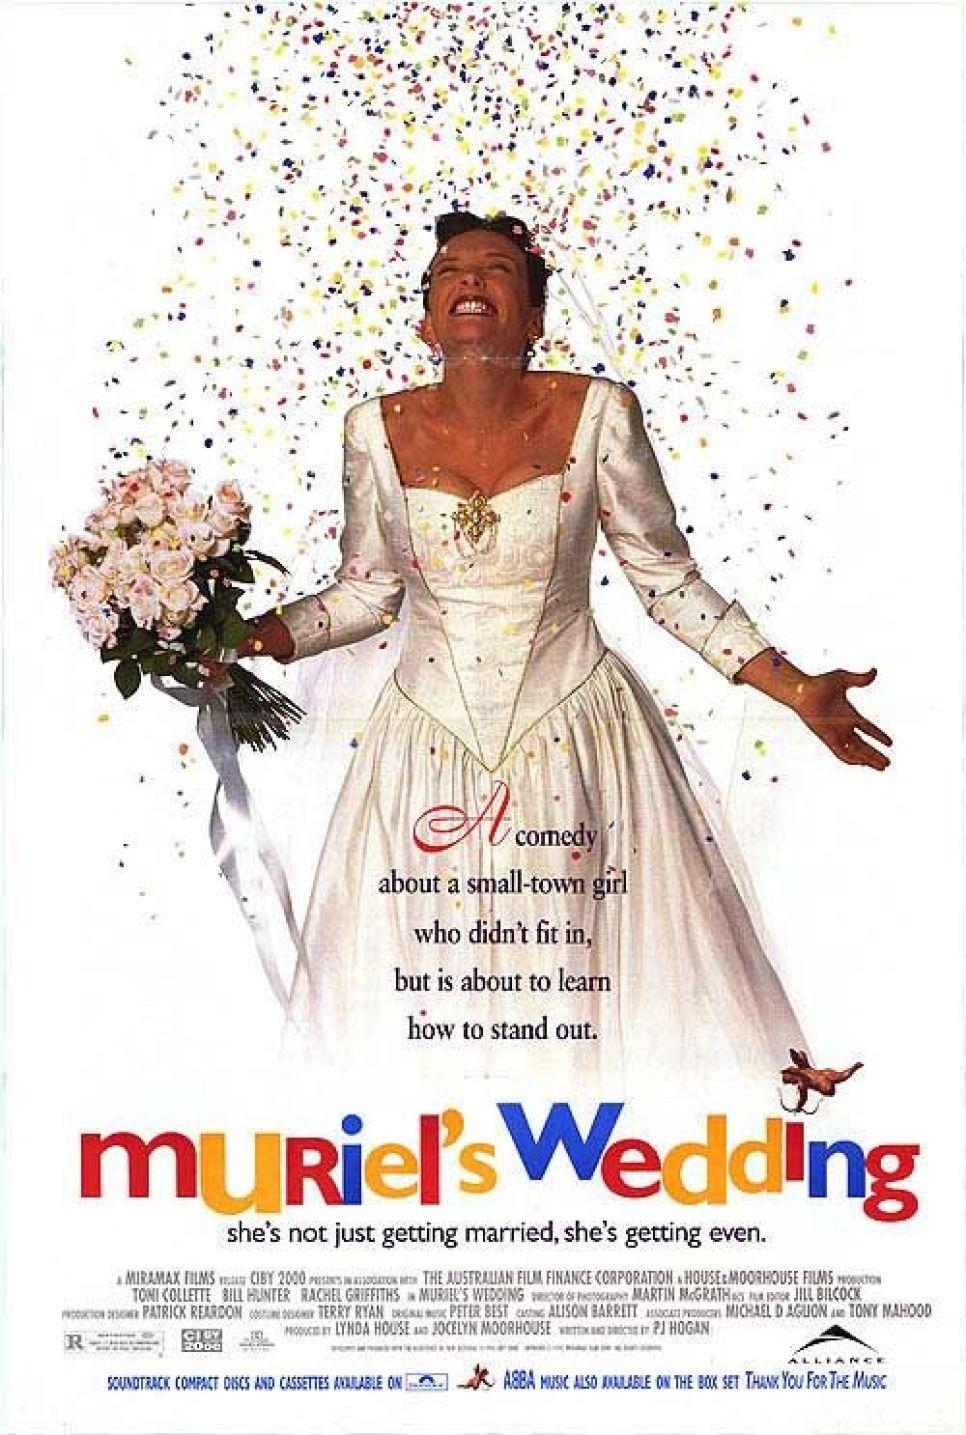 4-murielswedding.jpg